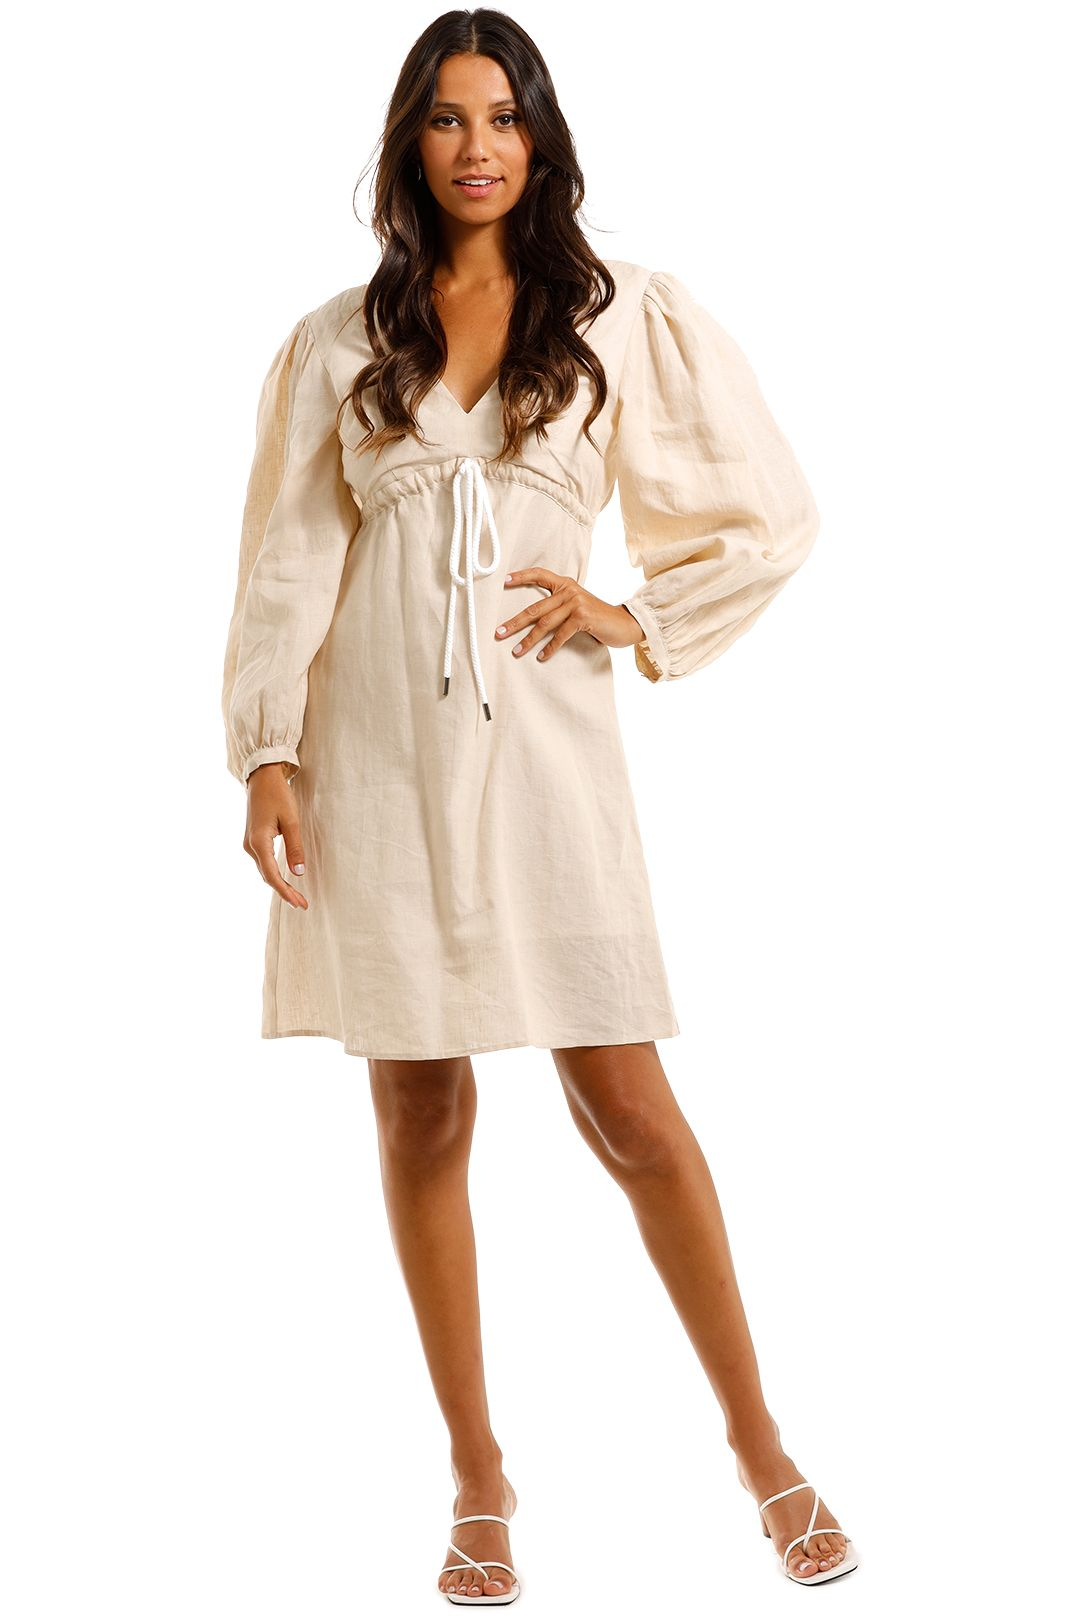 Apartment Clothing Linen Long Sleeve Mini Dress Summer Beige